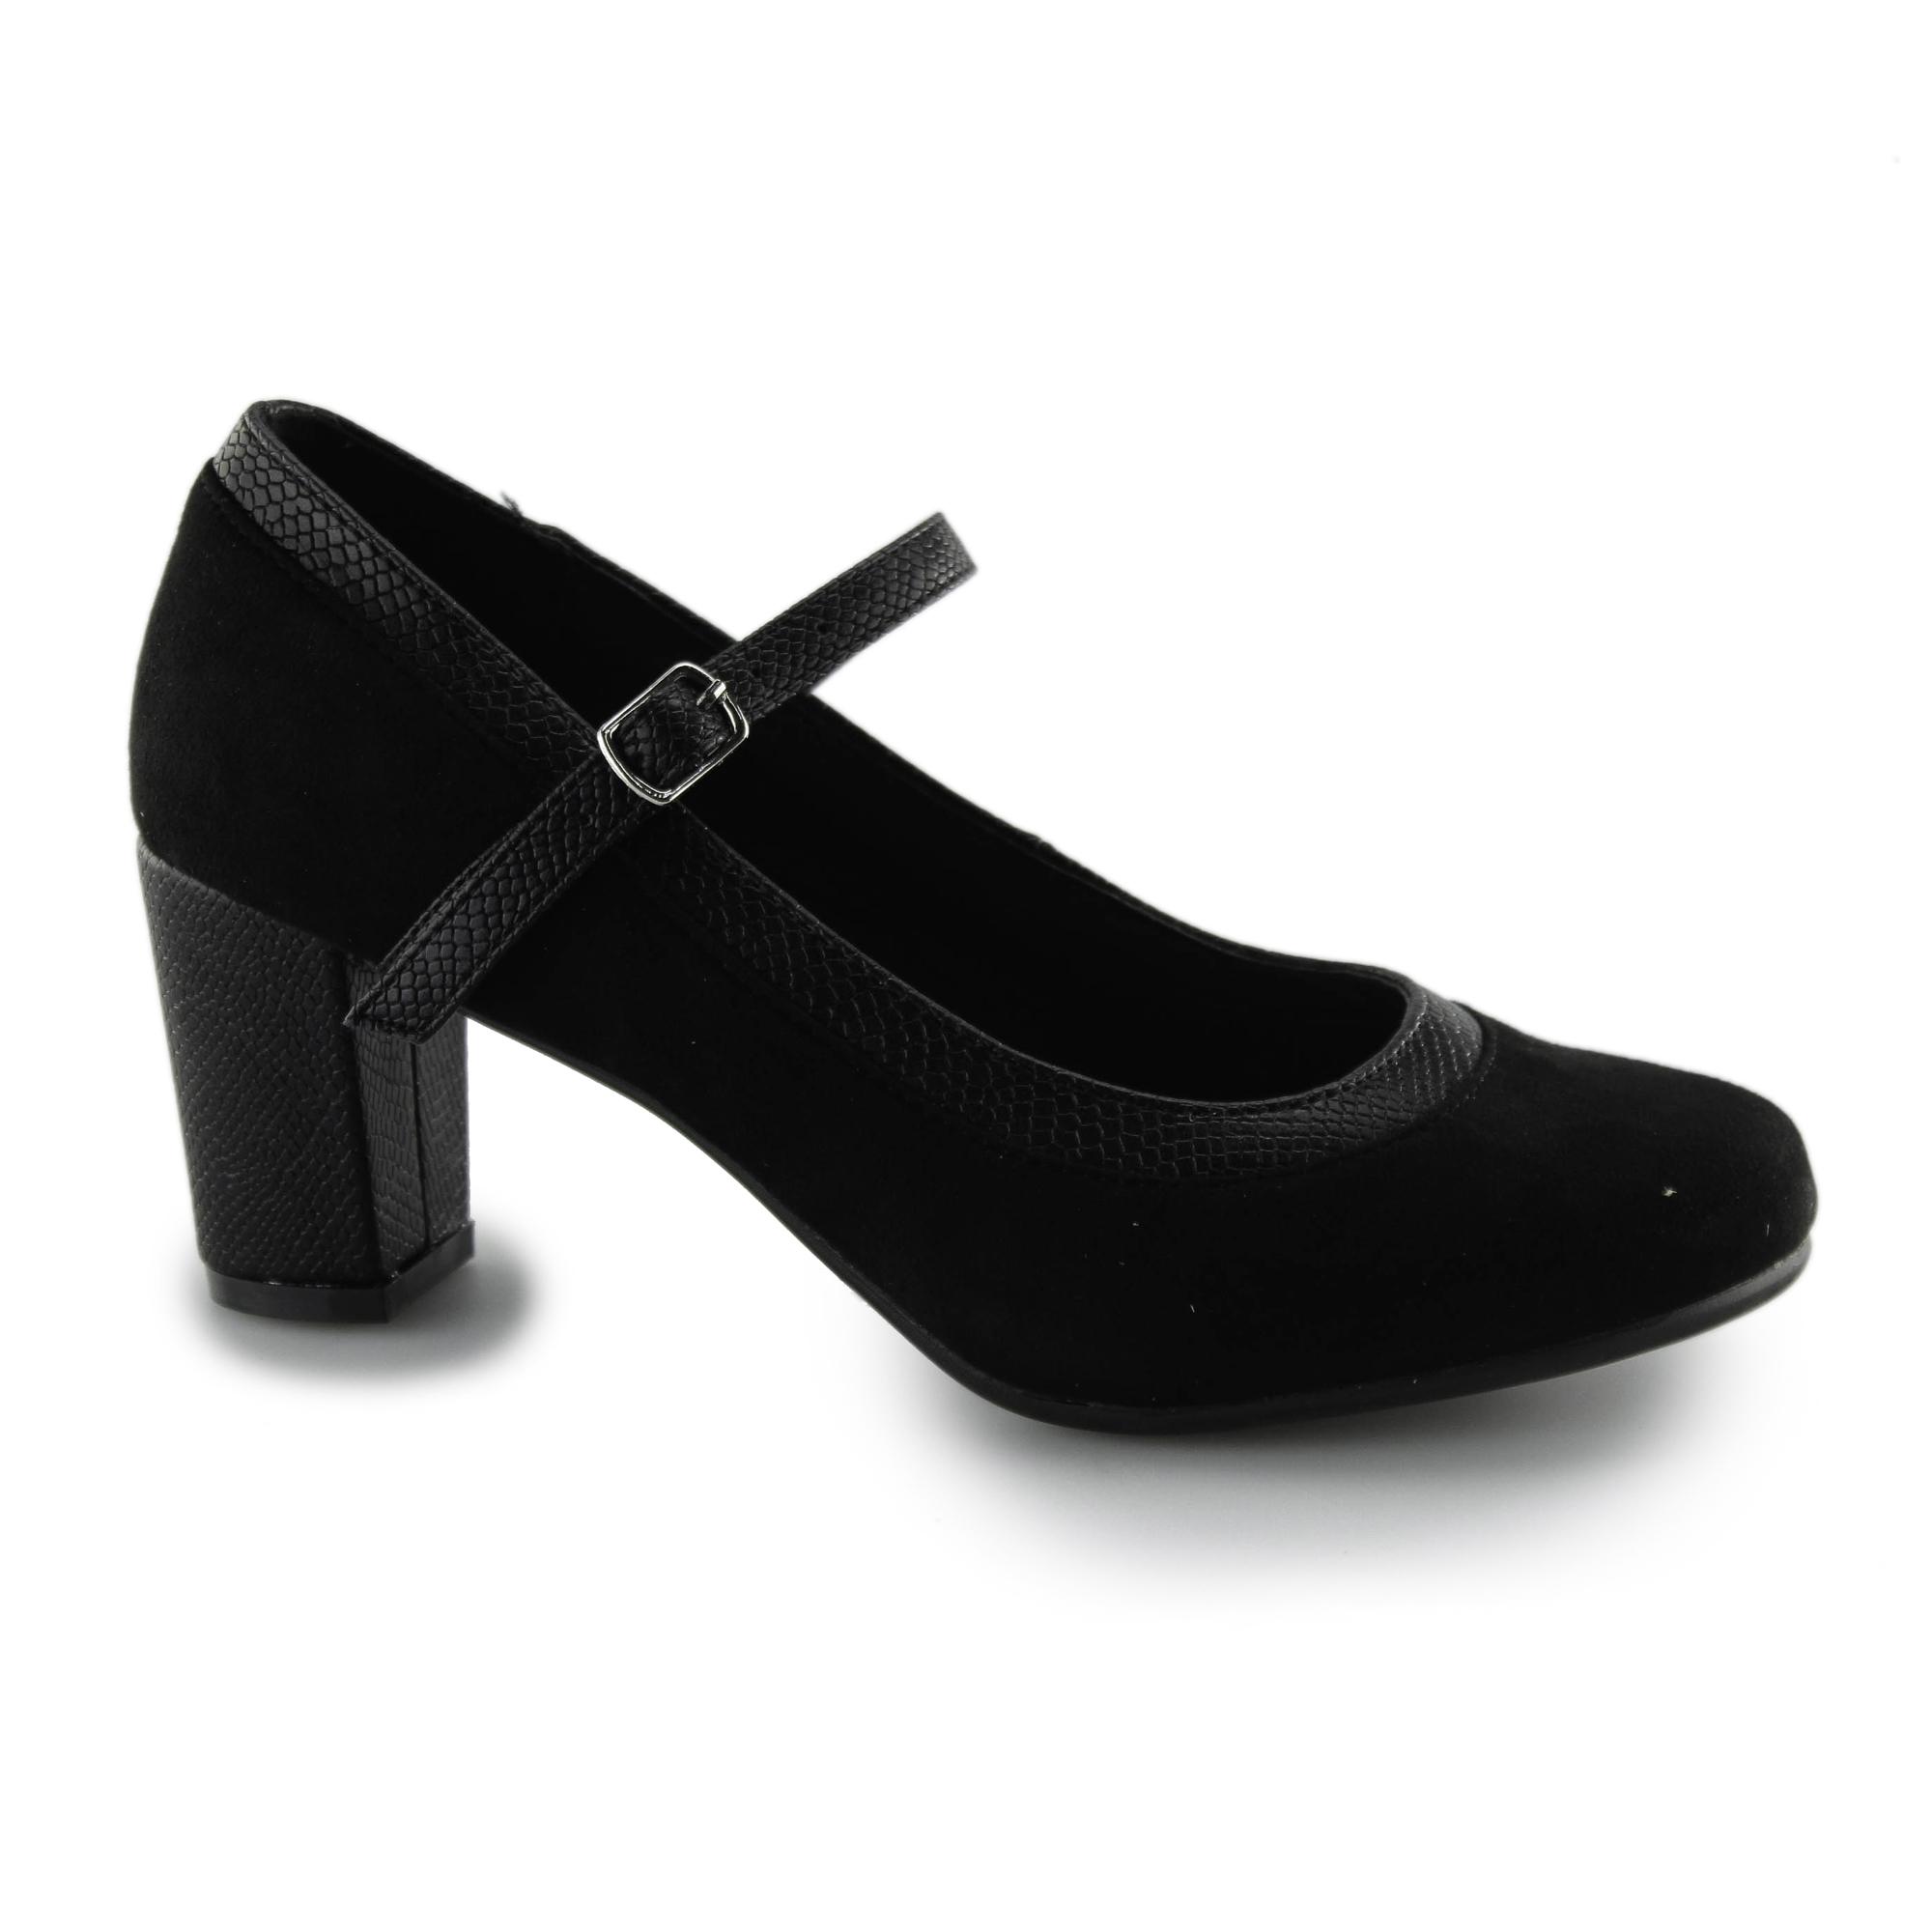 Comfort Plus Wide Fit Block Heel Mary Jane Style Shoes Patent Matt Court